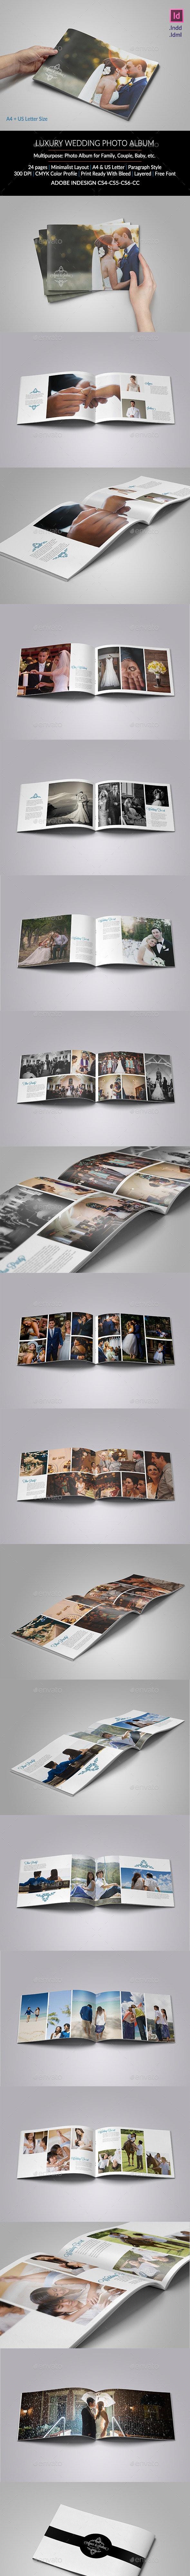 Luxury Wedding Album - Photo Albums Print Templates